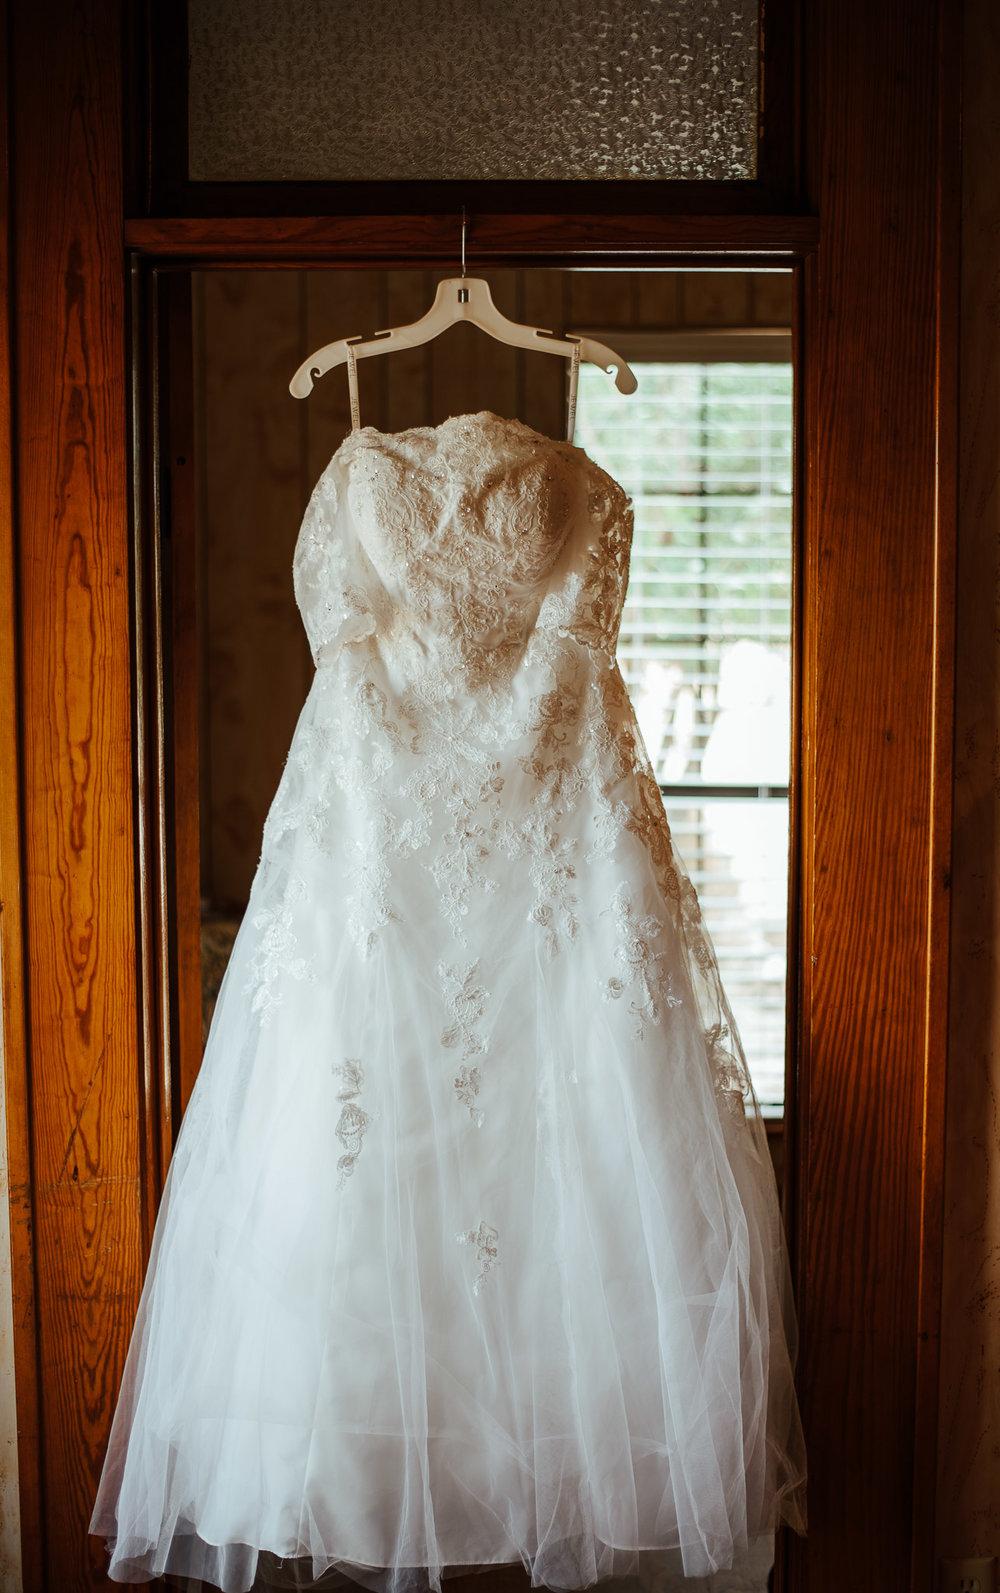 West-Texas-Wedding-Photographer-0001.jpg